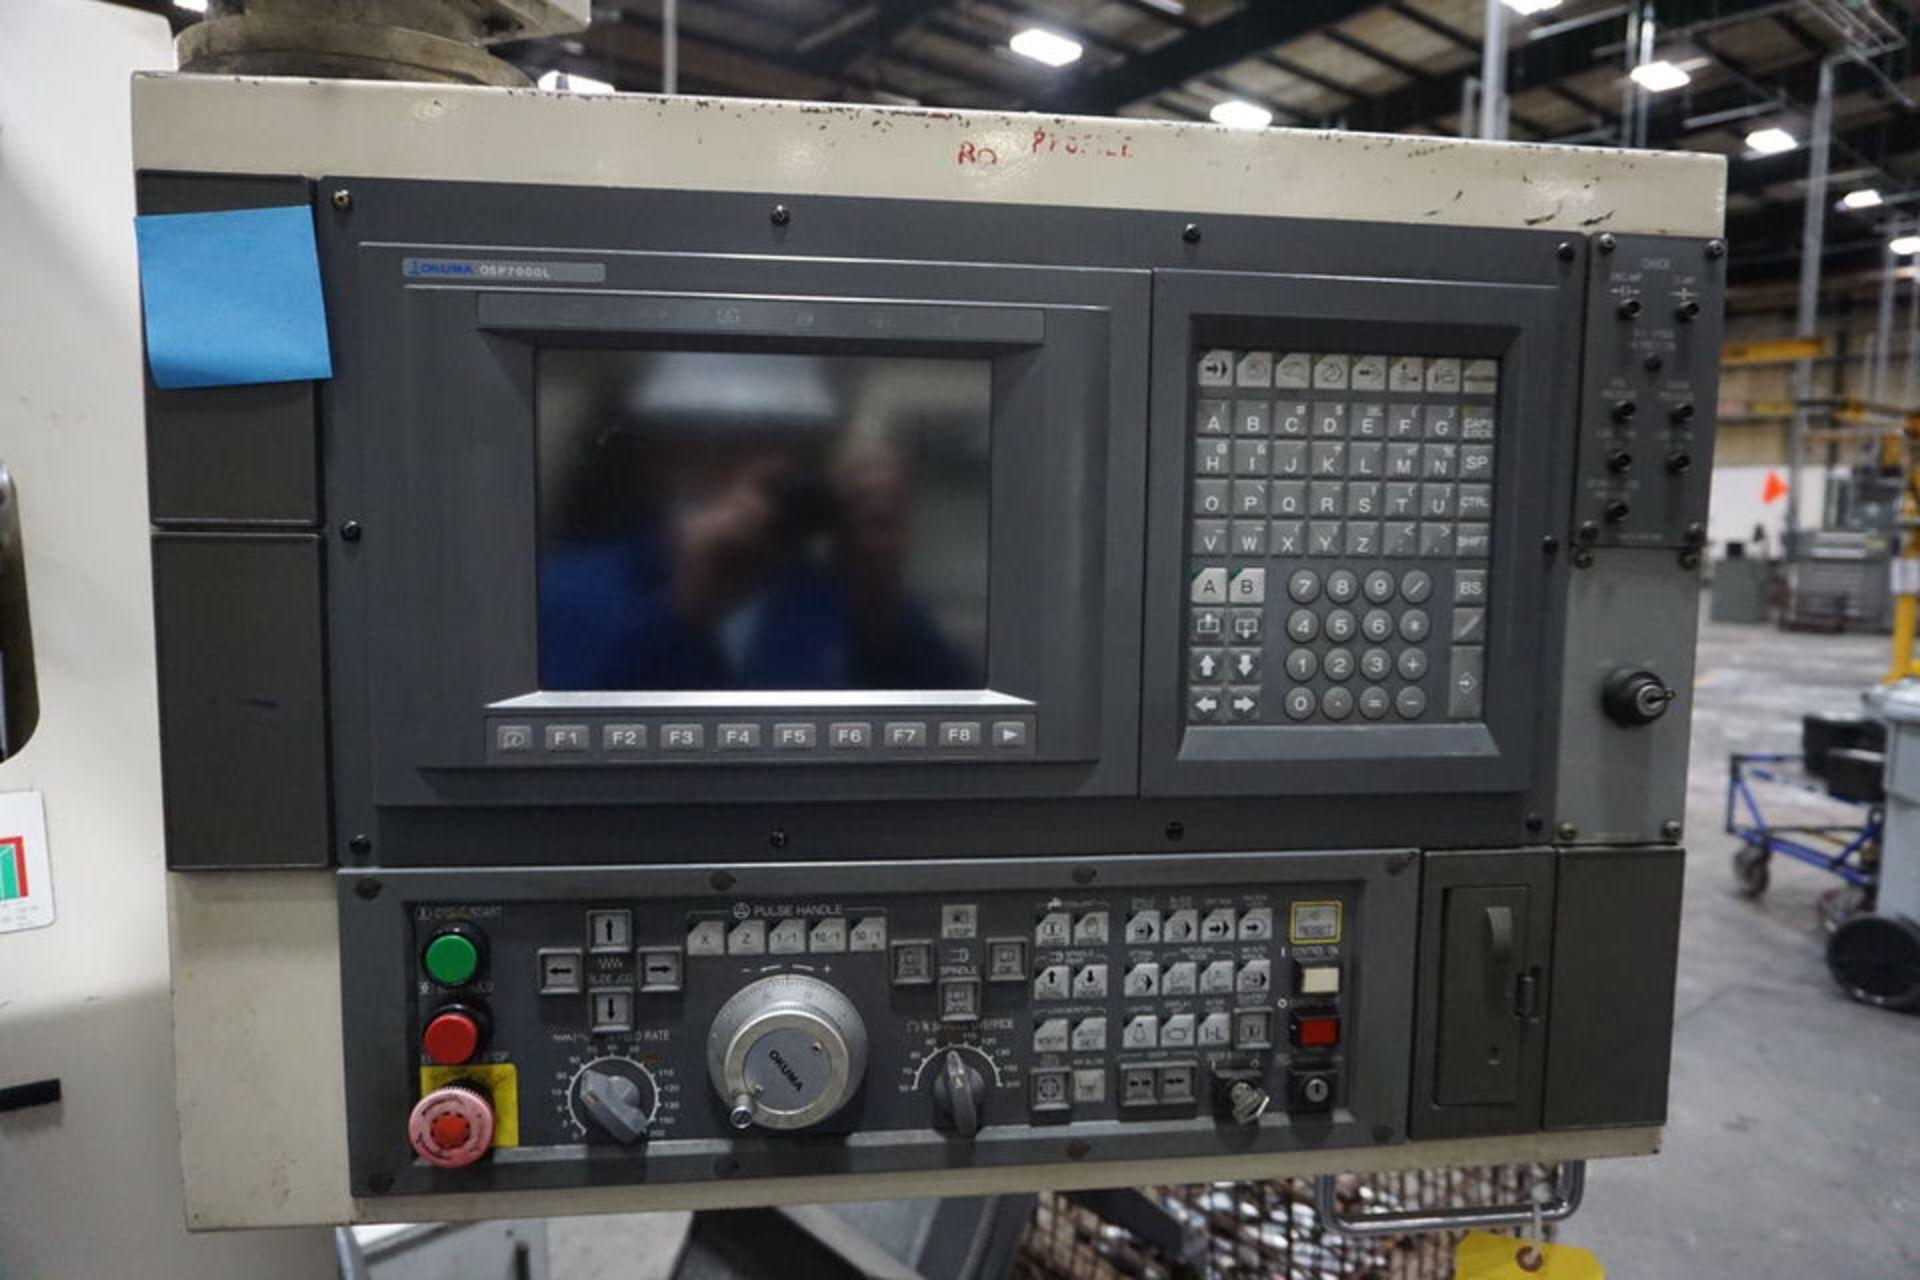 OKUMA LB35 CNC LATHE (PC0003255) - Image 4 of 8